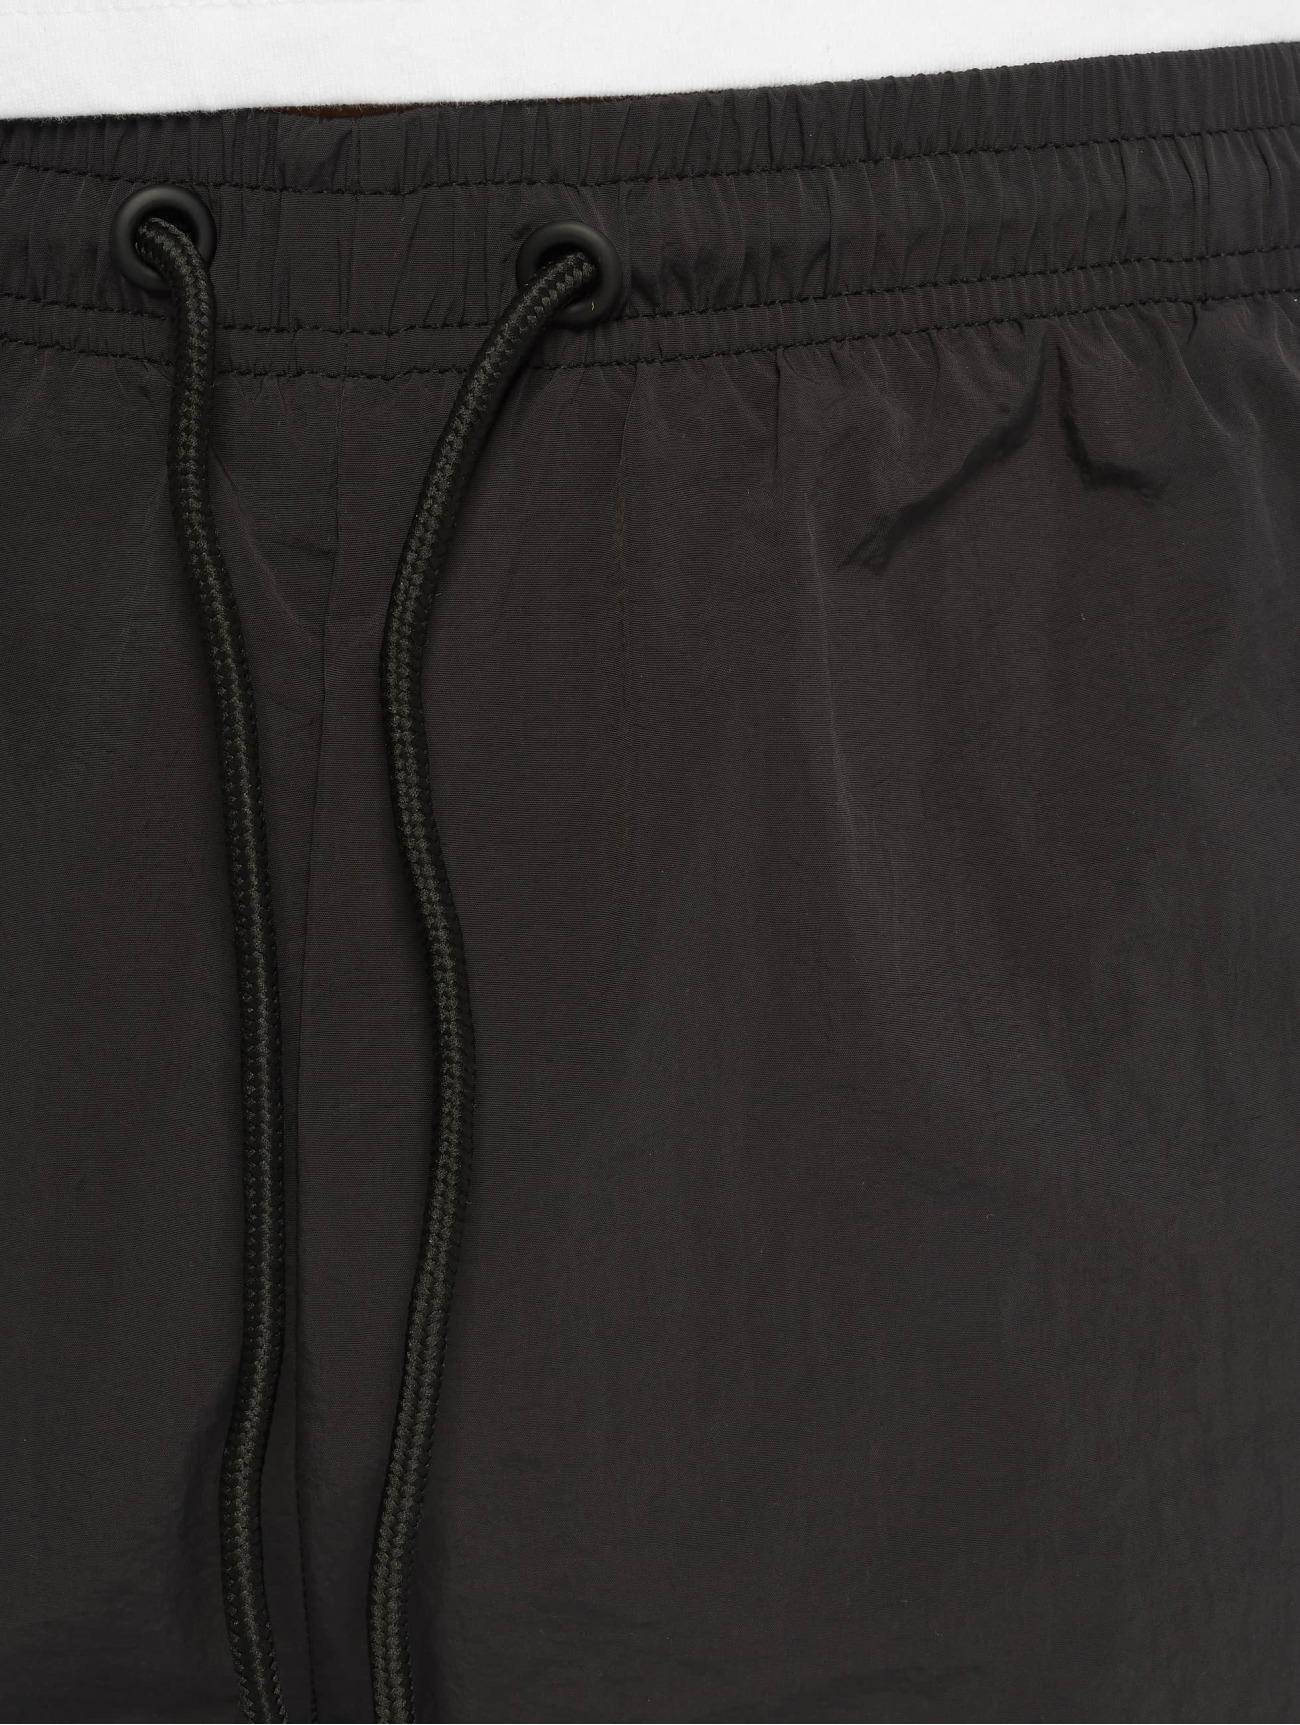 Urban Classics  3-Tone Crinkle  noir Homme Jogging  636526 Homme Pantalons & Shorts